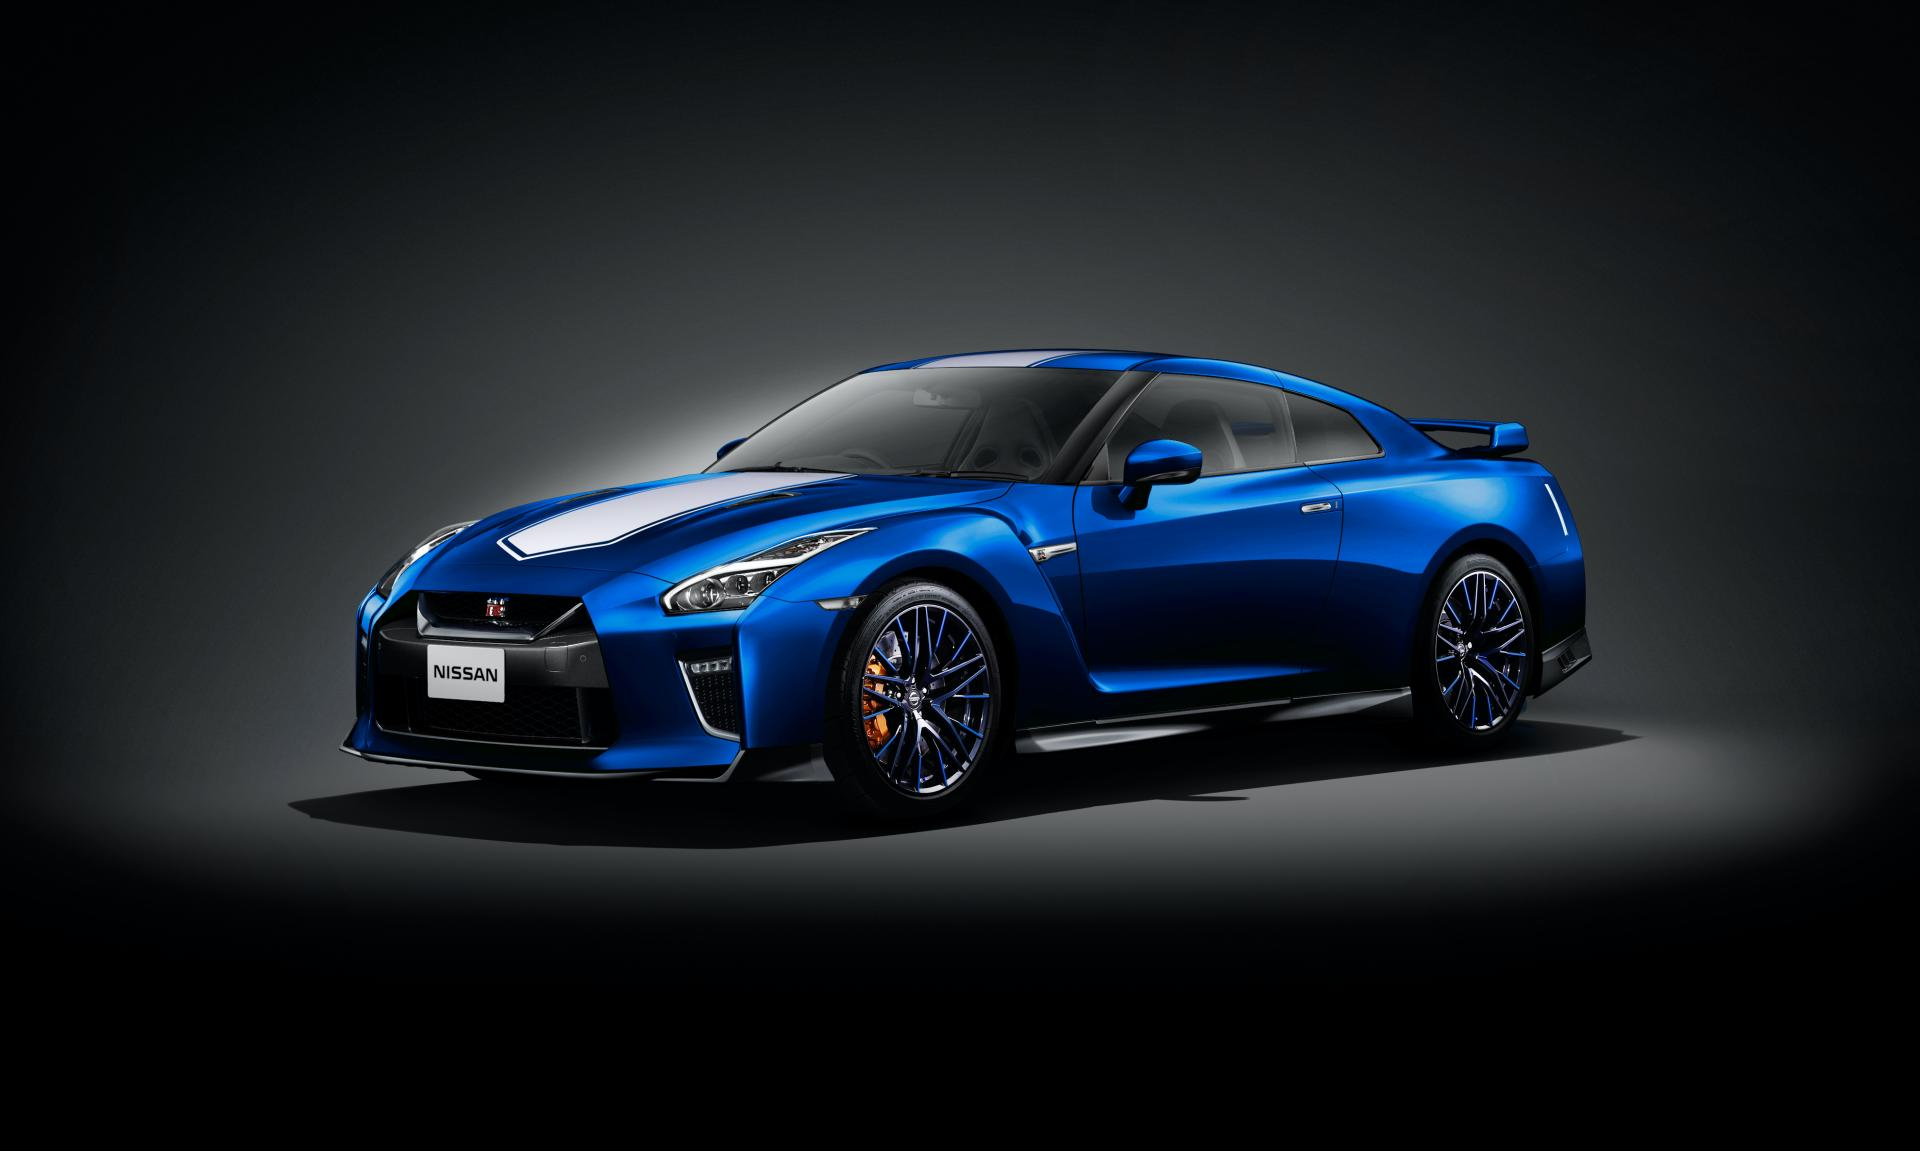 Nissan-GT-R-50th-Anniversary